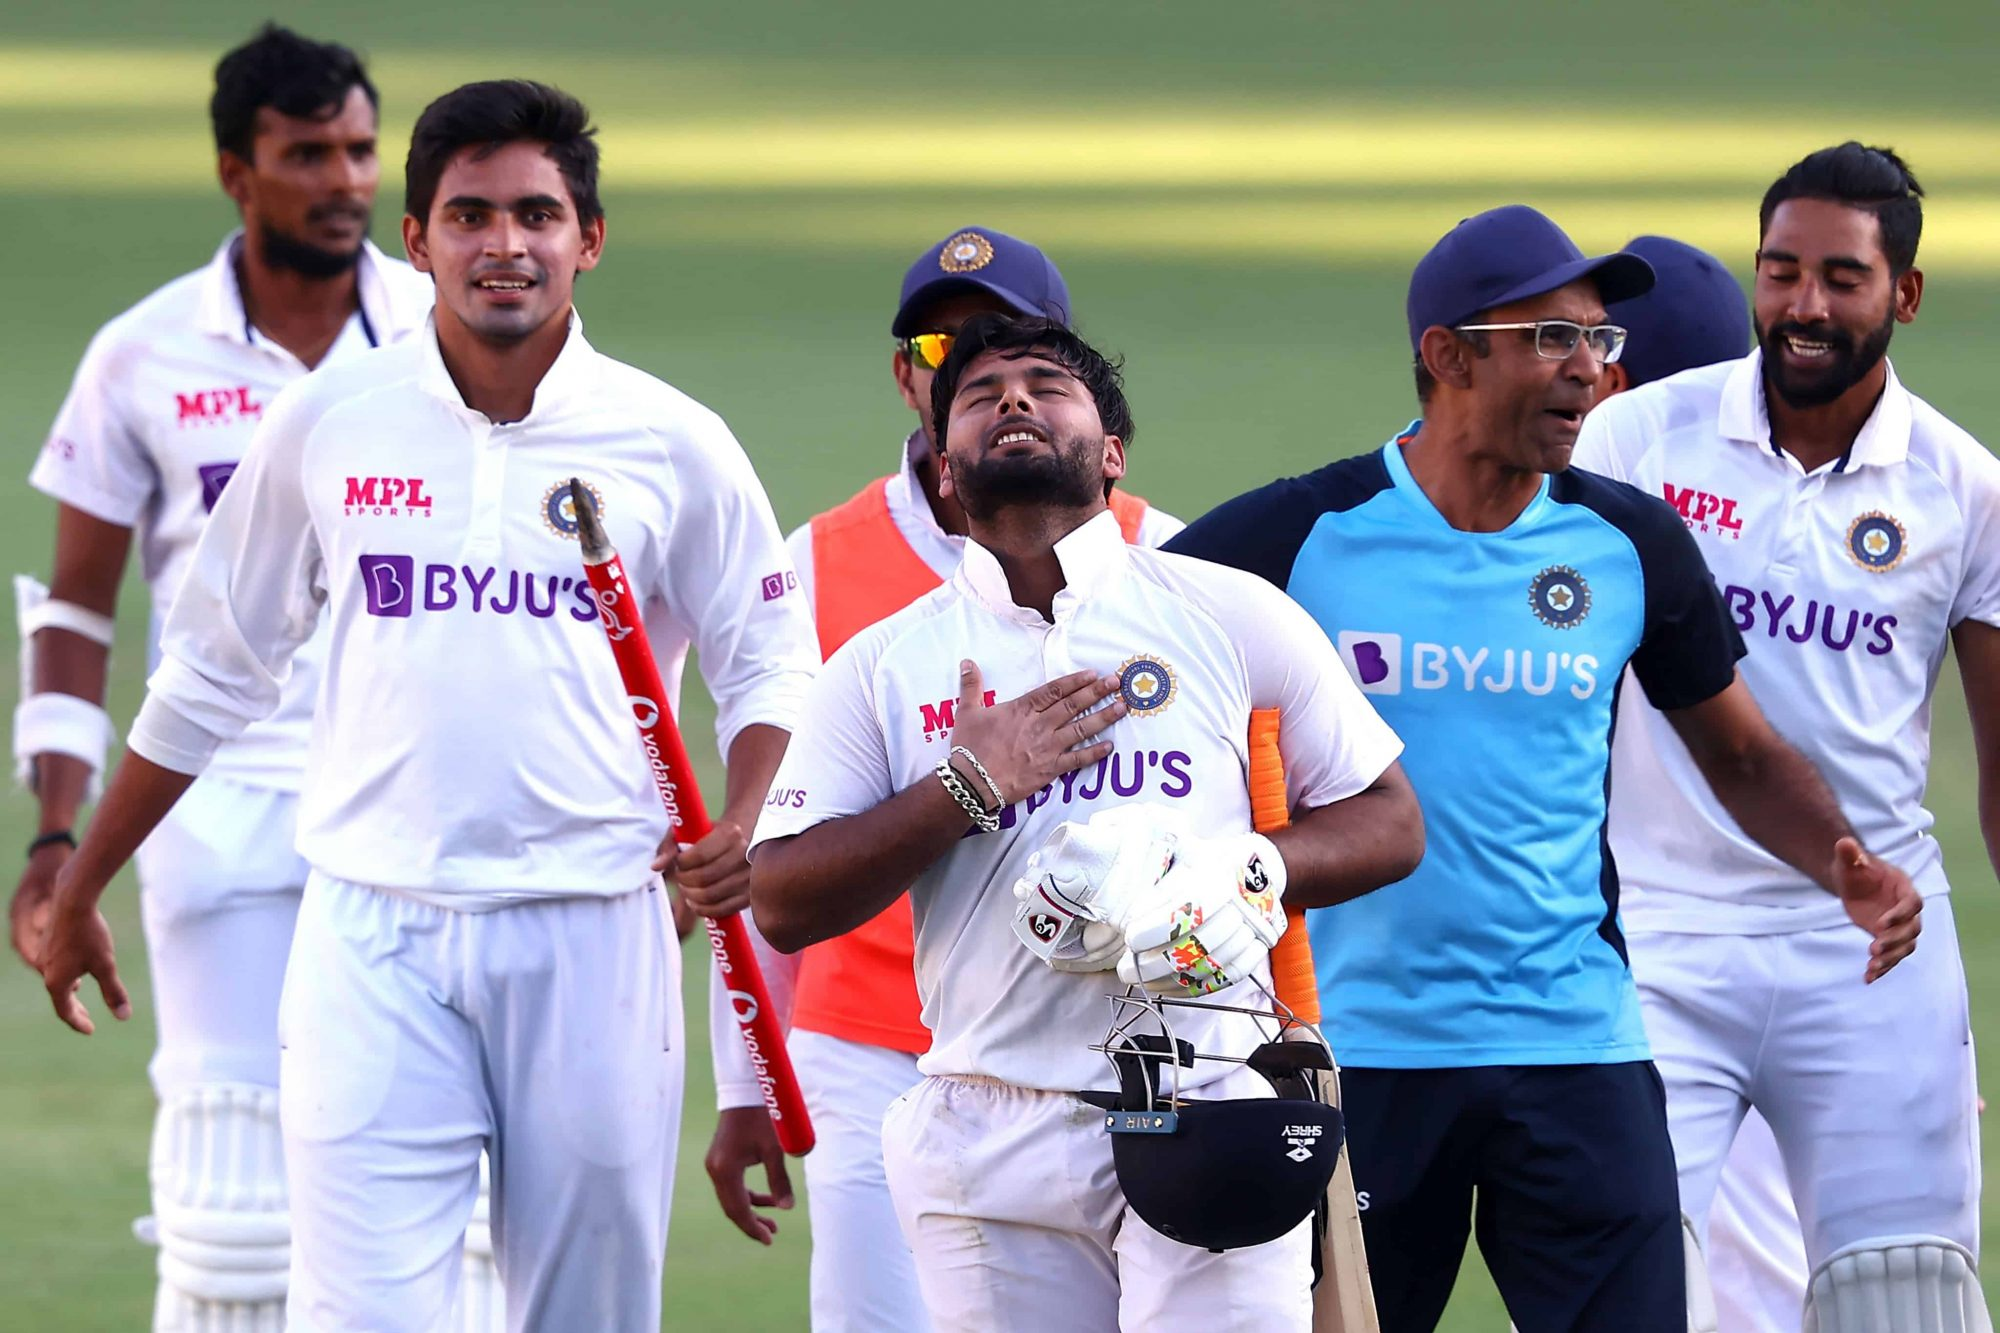 ICC Test Rankings: Virat Kohli Drops to 4th, Rishabh Pant Becomes Best Ranked Wicket-Keeper Batsman